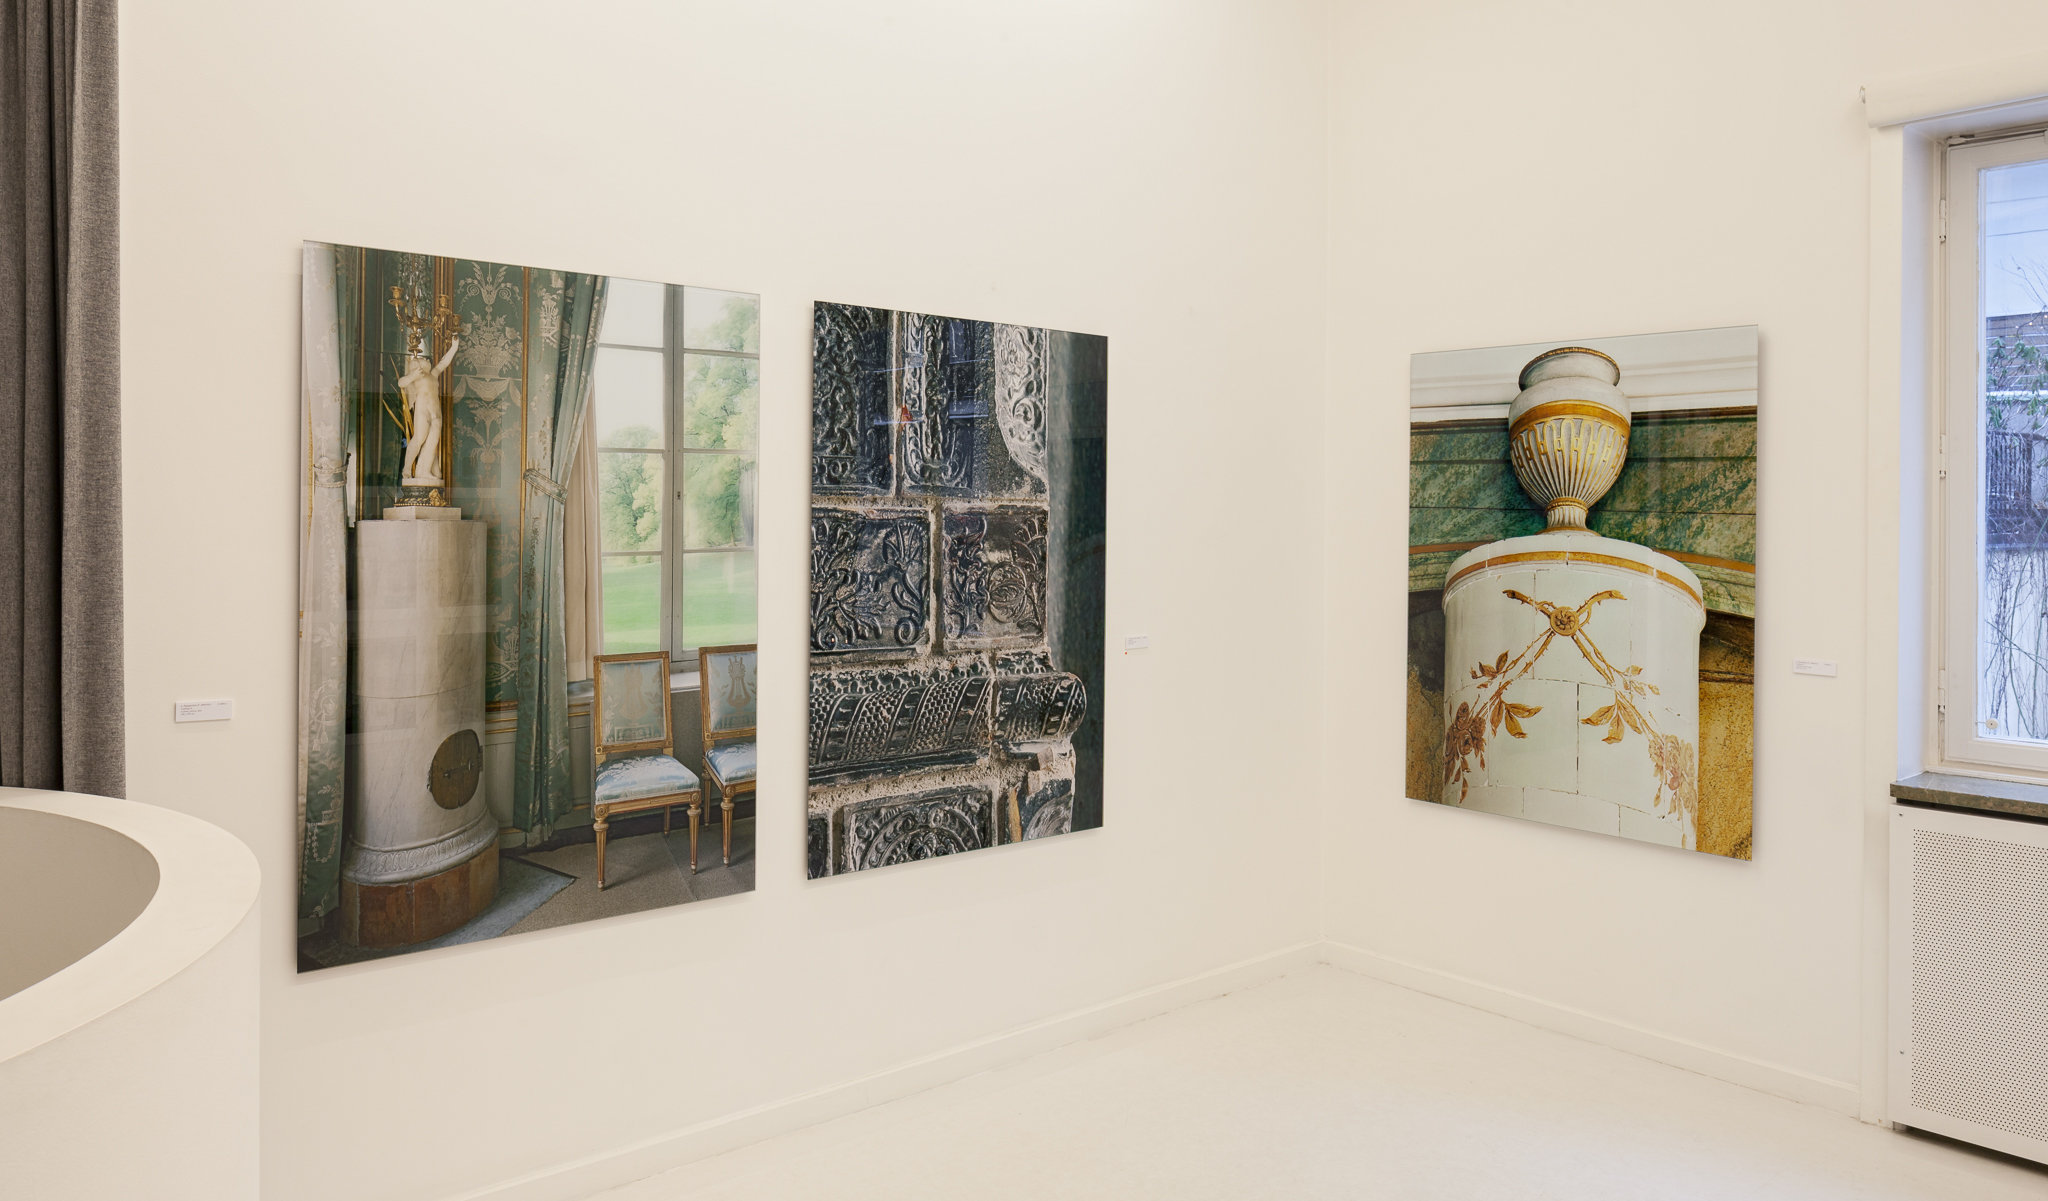 Main Gallery, Stockholm – Third Room